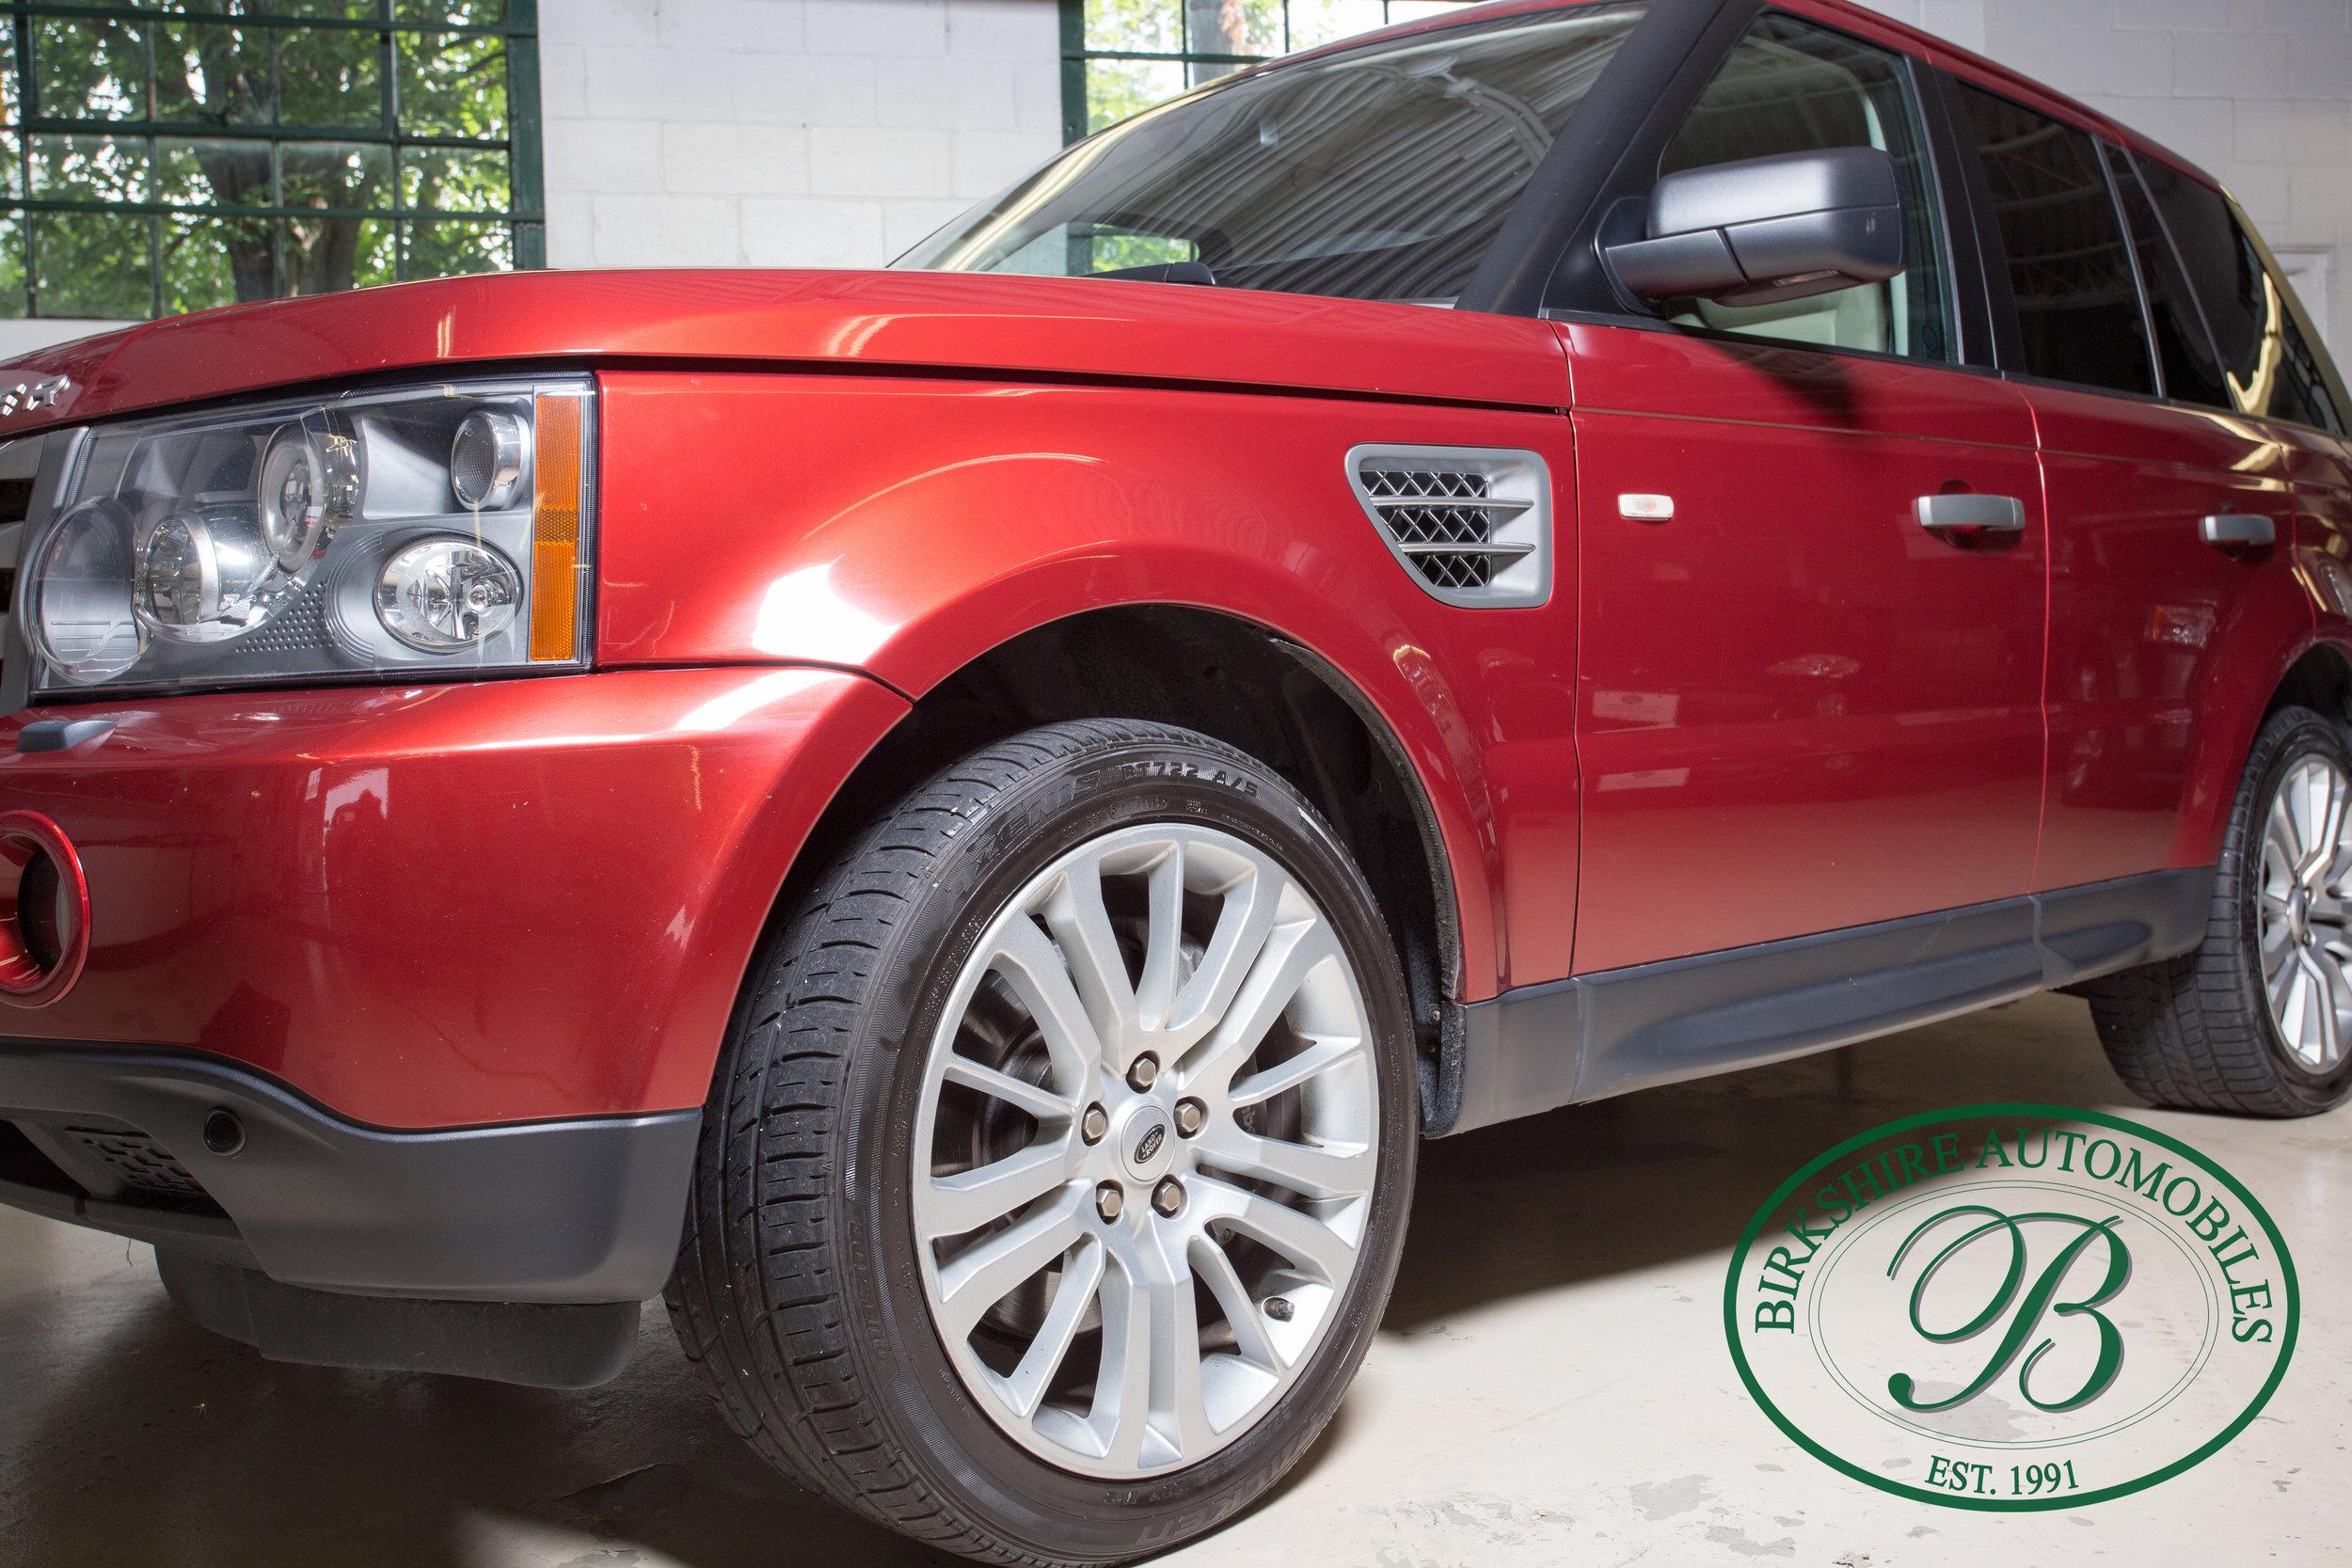 Birkshire Automobiles 2009 Range Rover Burgundy-37.jpg